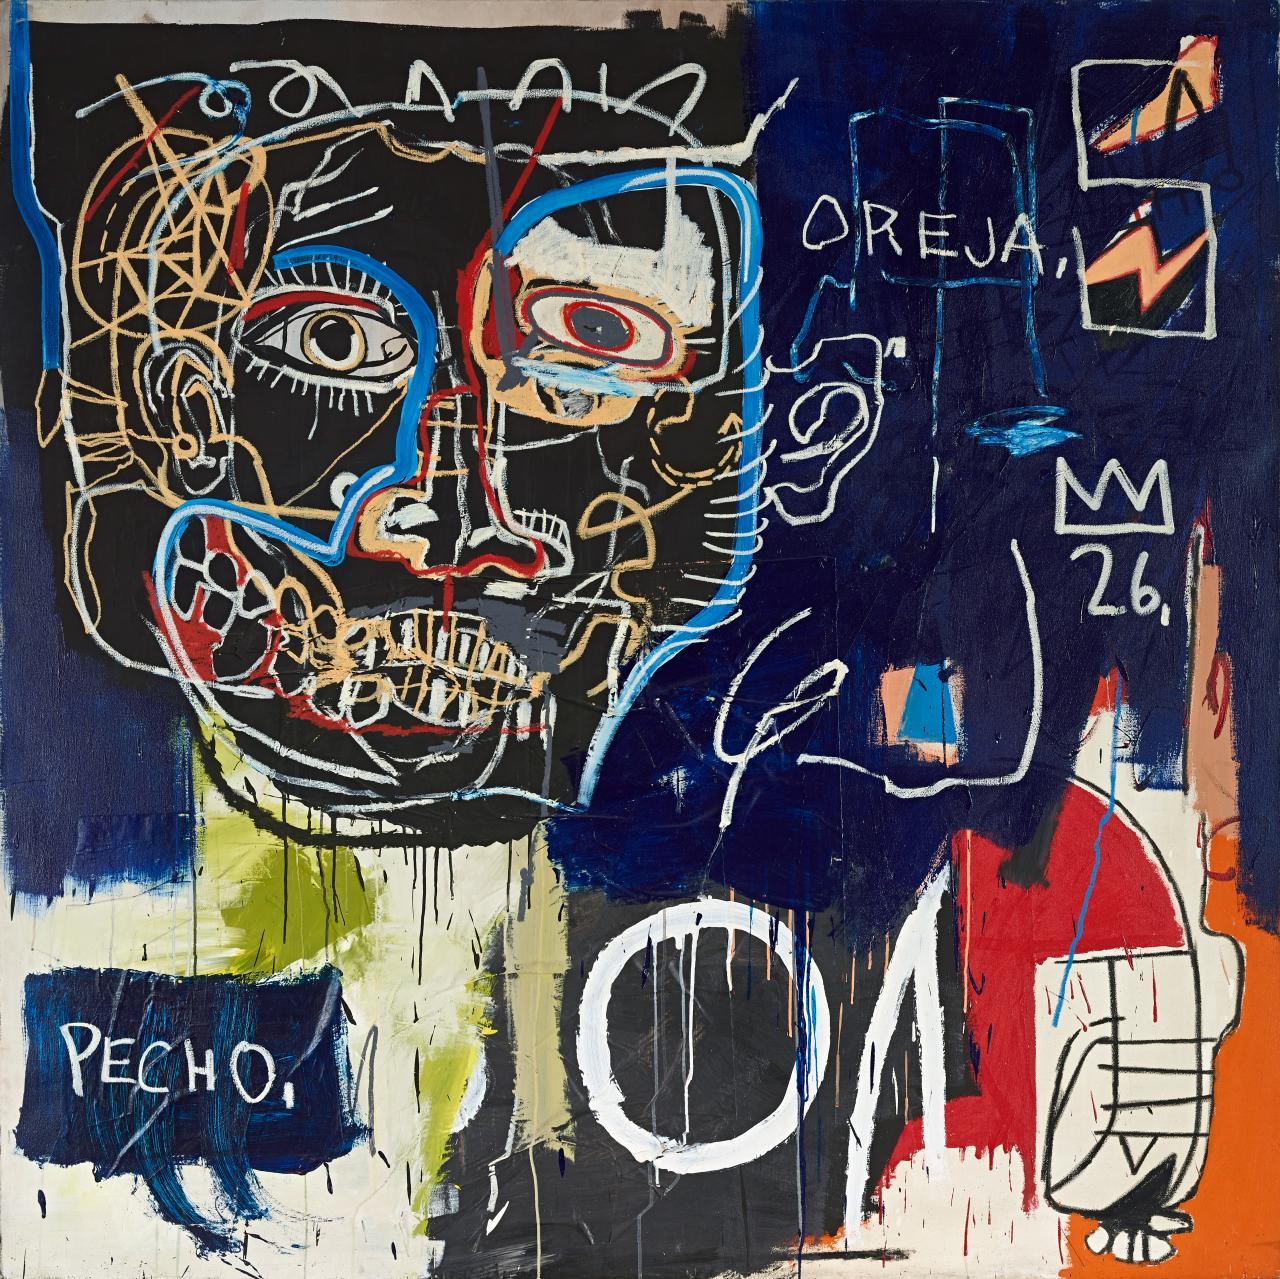 Keith Haring | Jean-Michel Basquiat | NGV